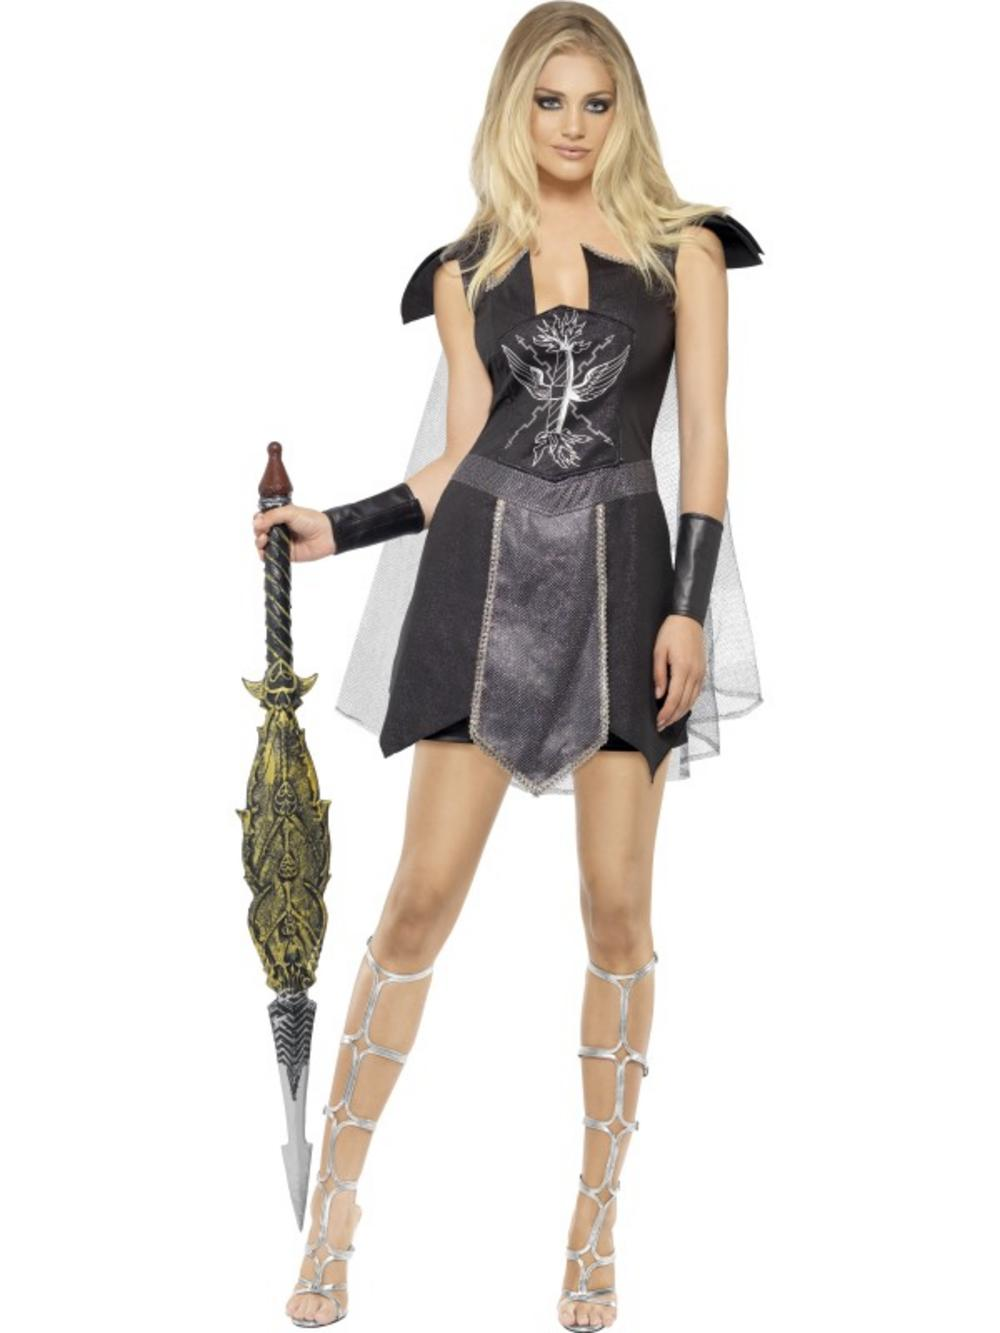 Xena Warrior Princess Costume Gallery Xena Warrior P...